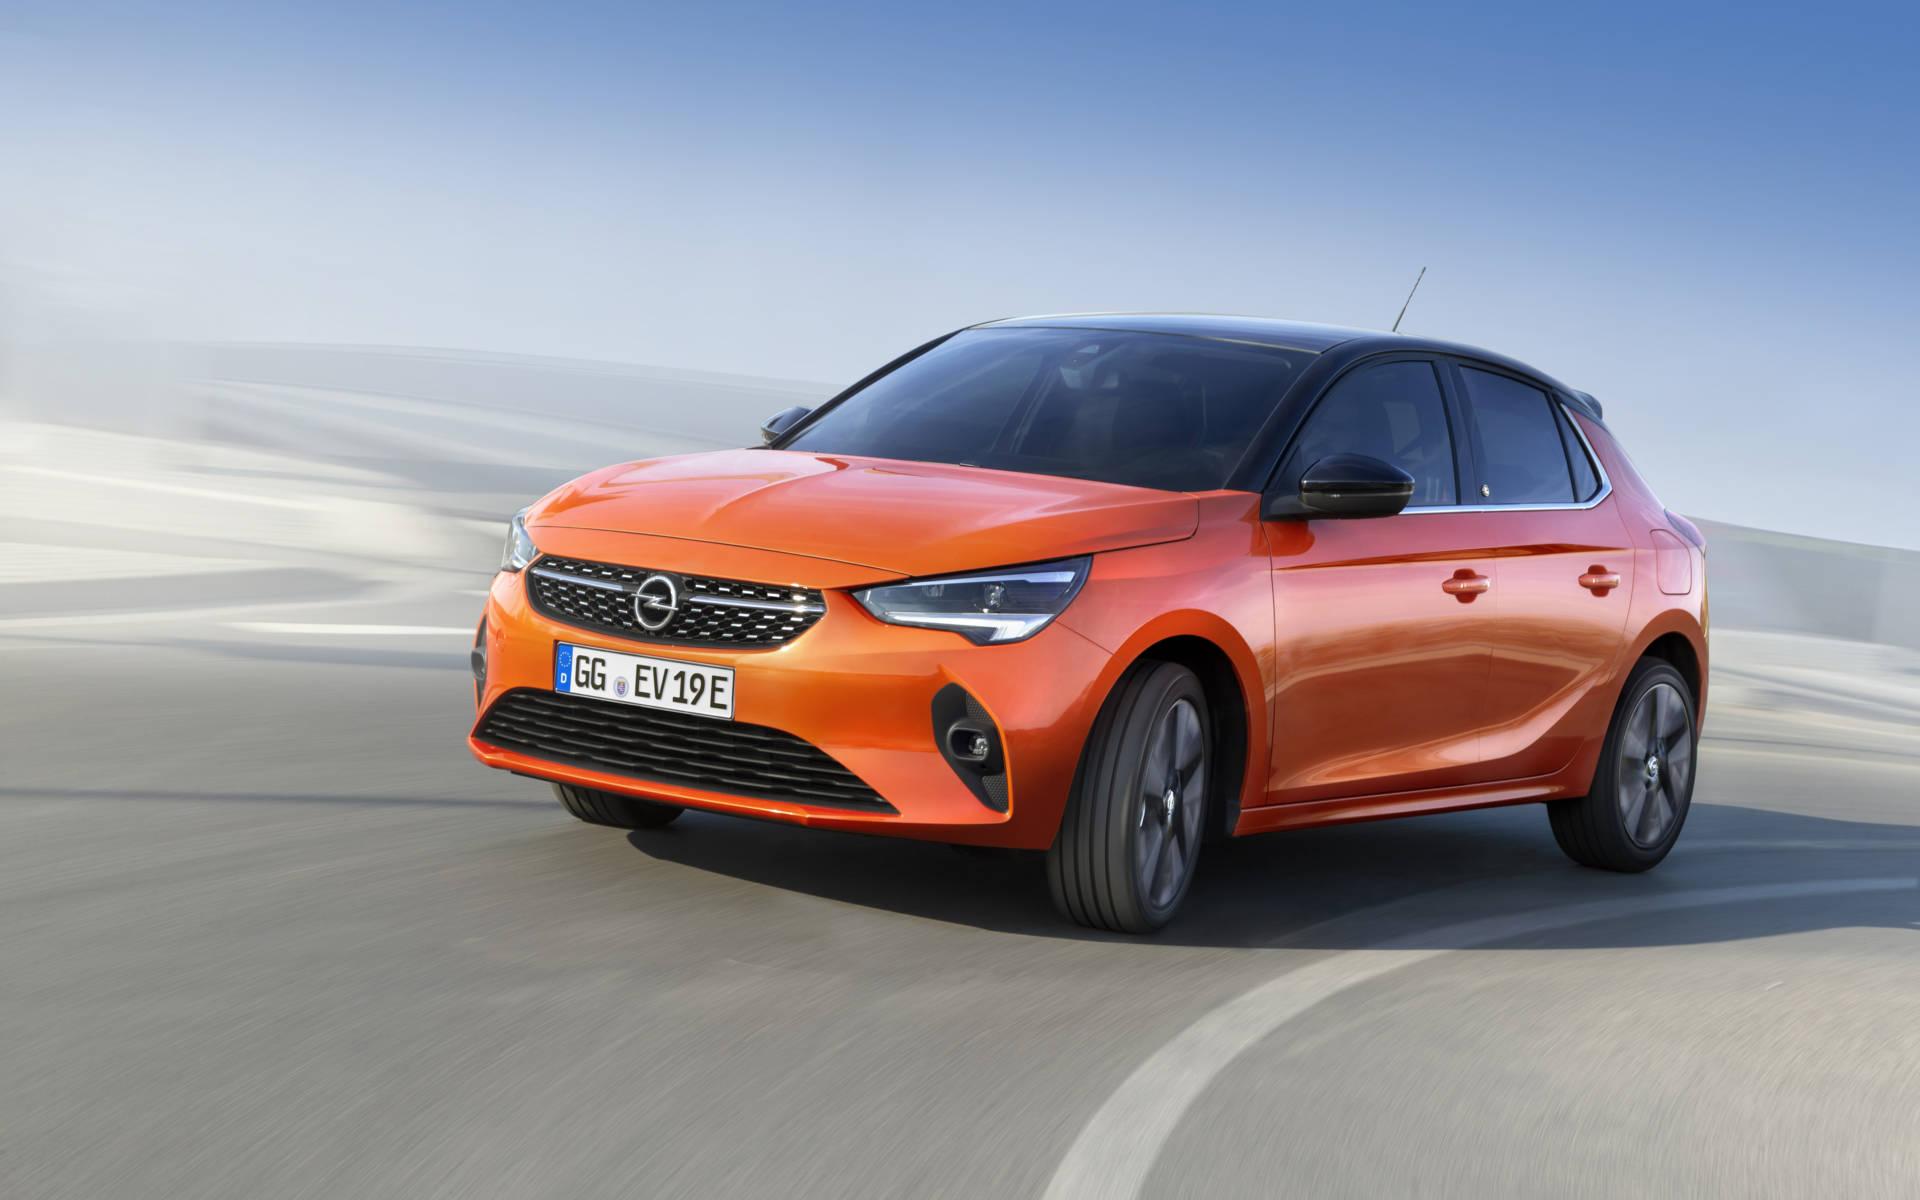 Orangener Opel Corsa e Elektroauto